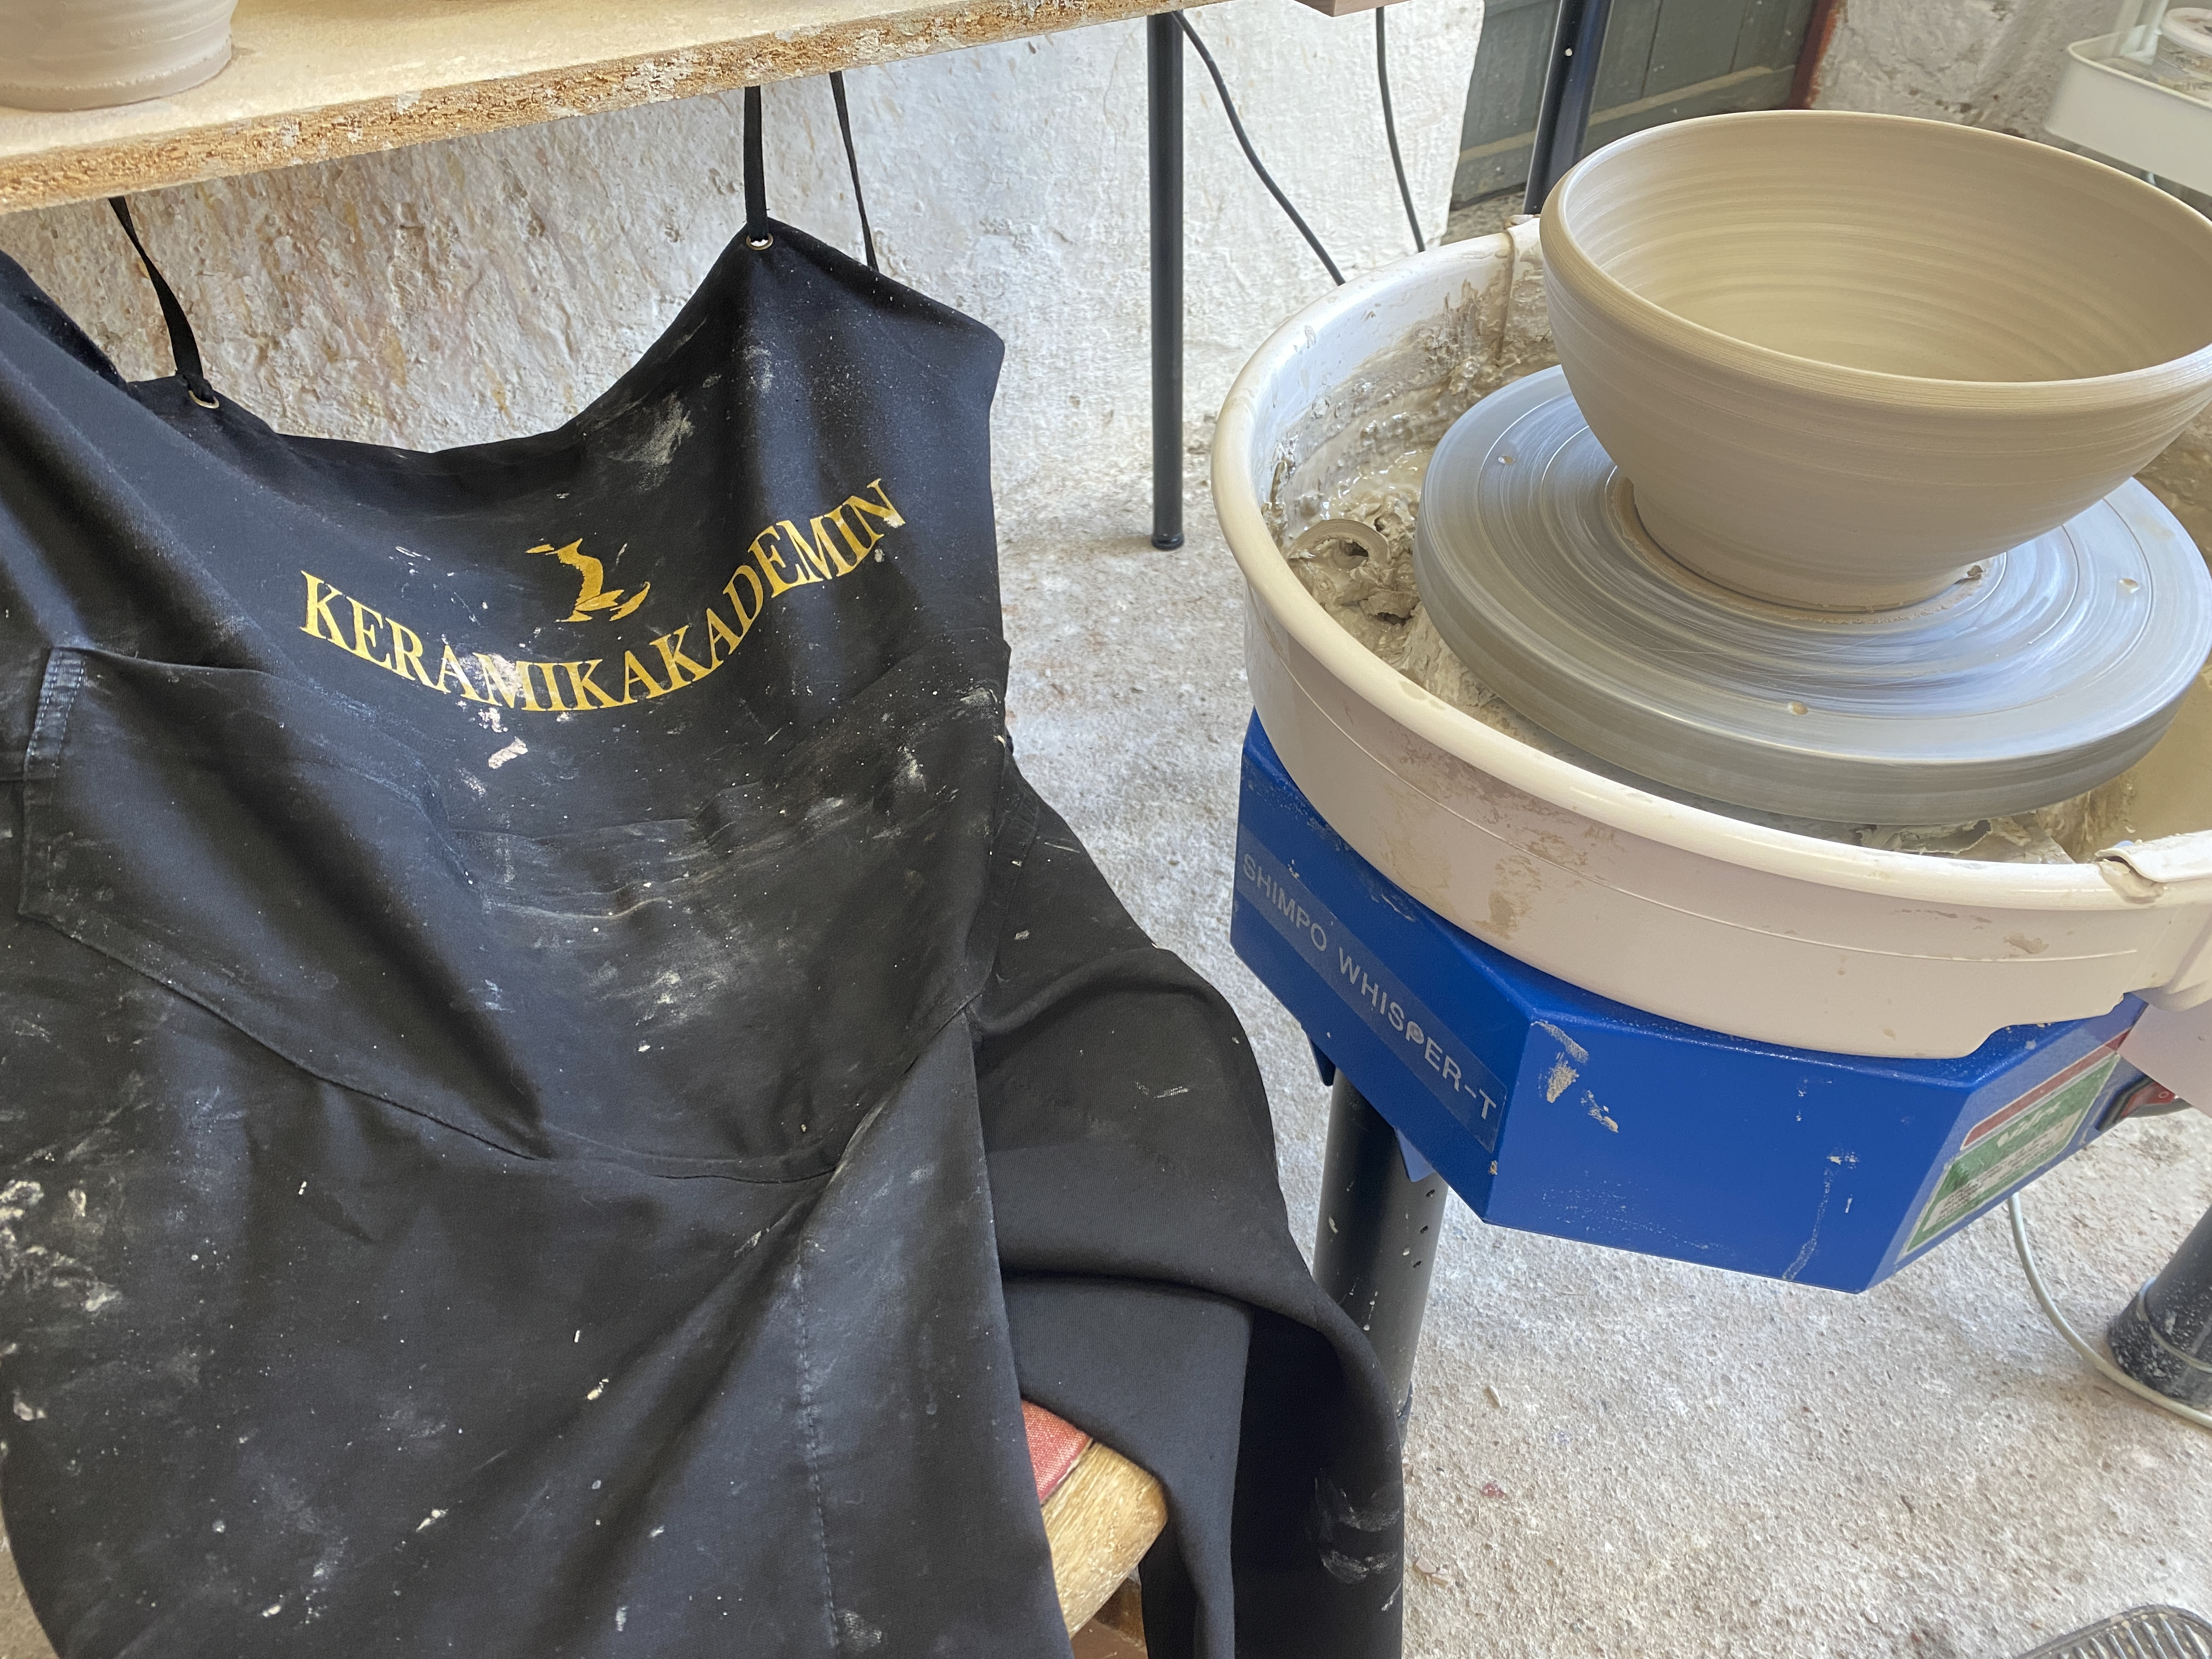 KeramikAkademins drejförkläde